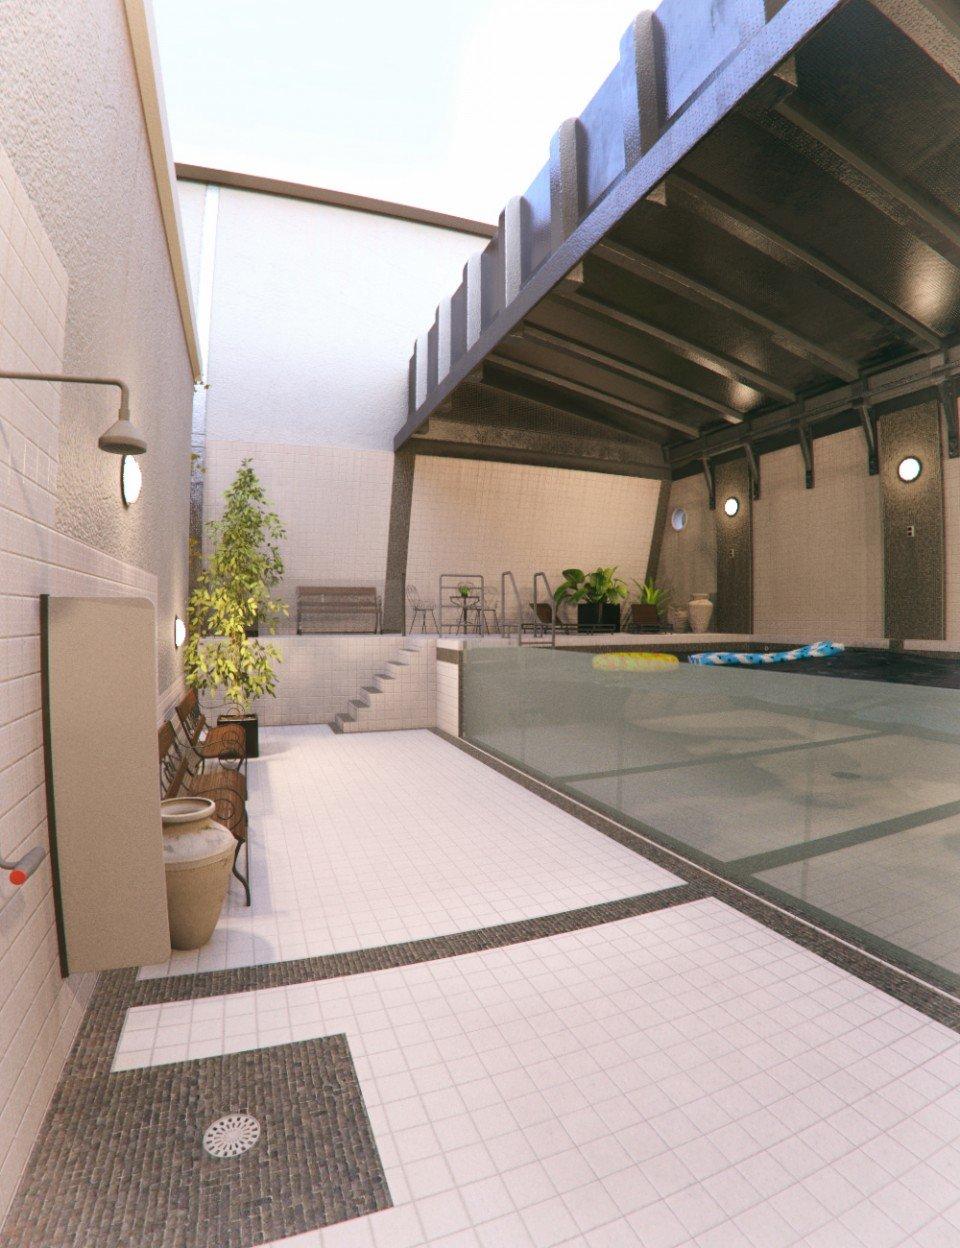 Private Pool_DAZ3D下载站